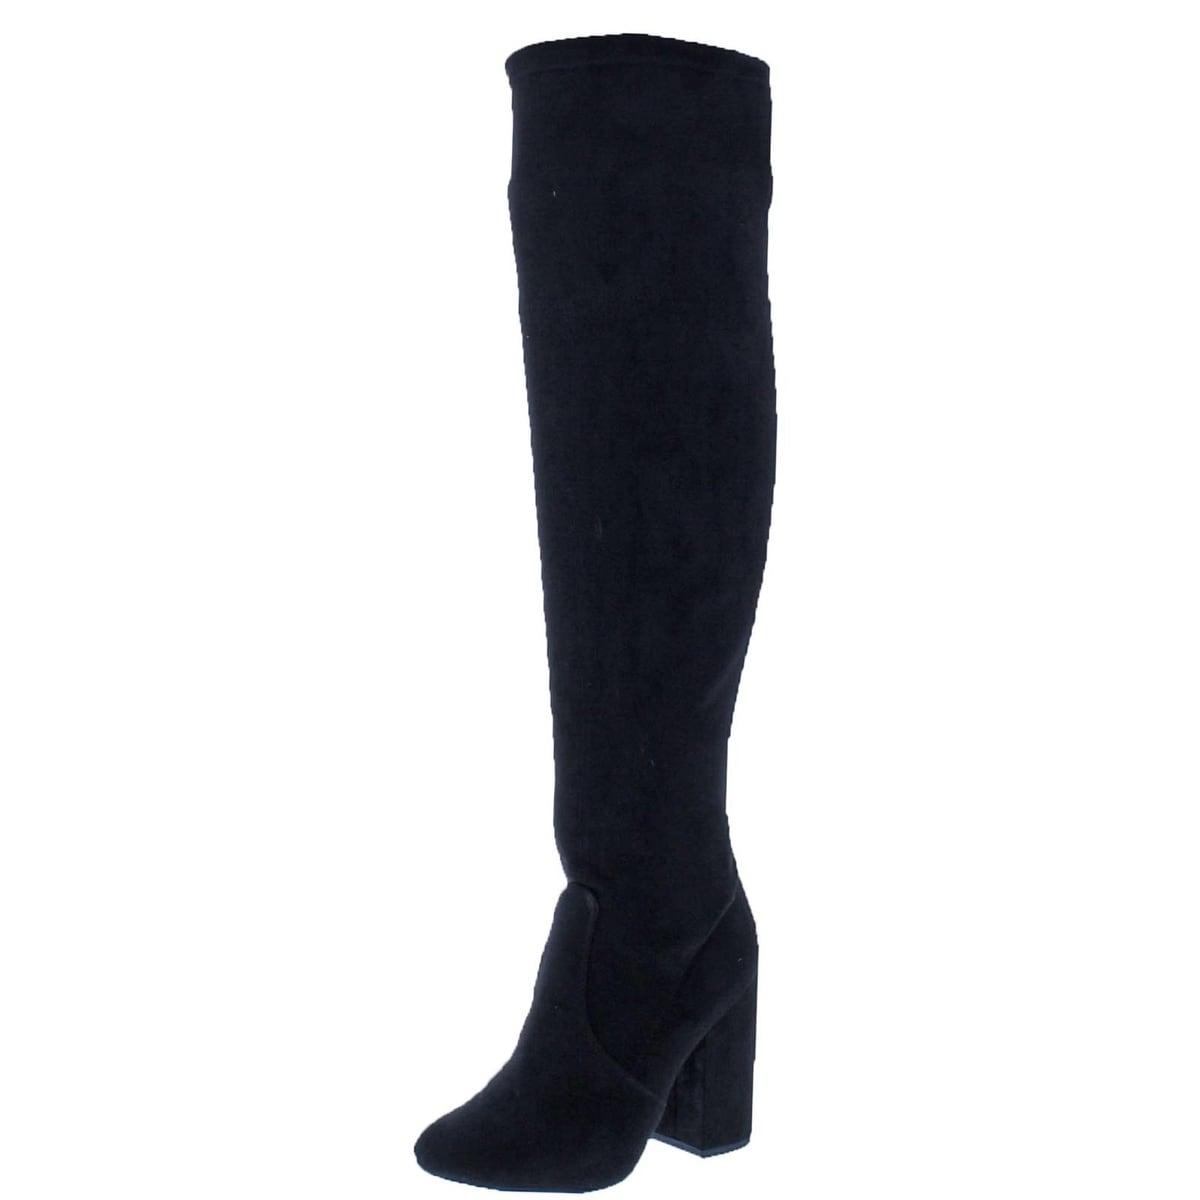 8b5abaf5801 Shop Steve Madden Womens Niela Over-The-Knee Boots Tall Dress - 7.5 medium  (b